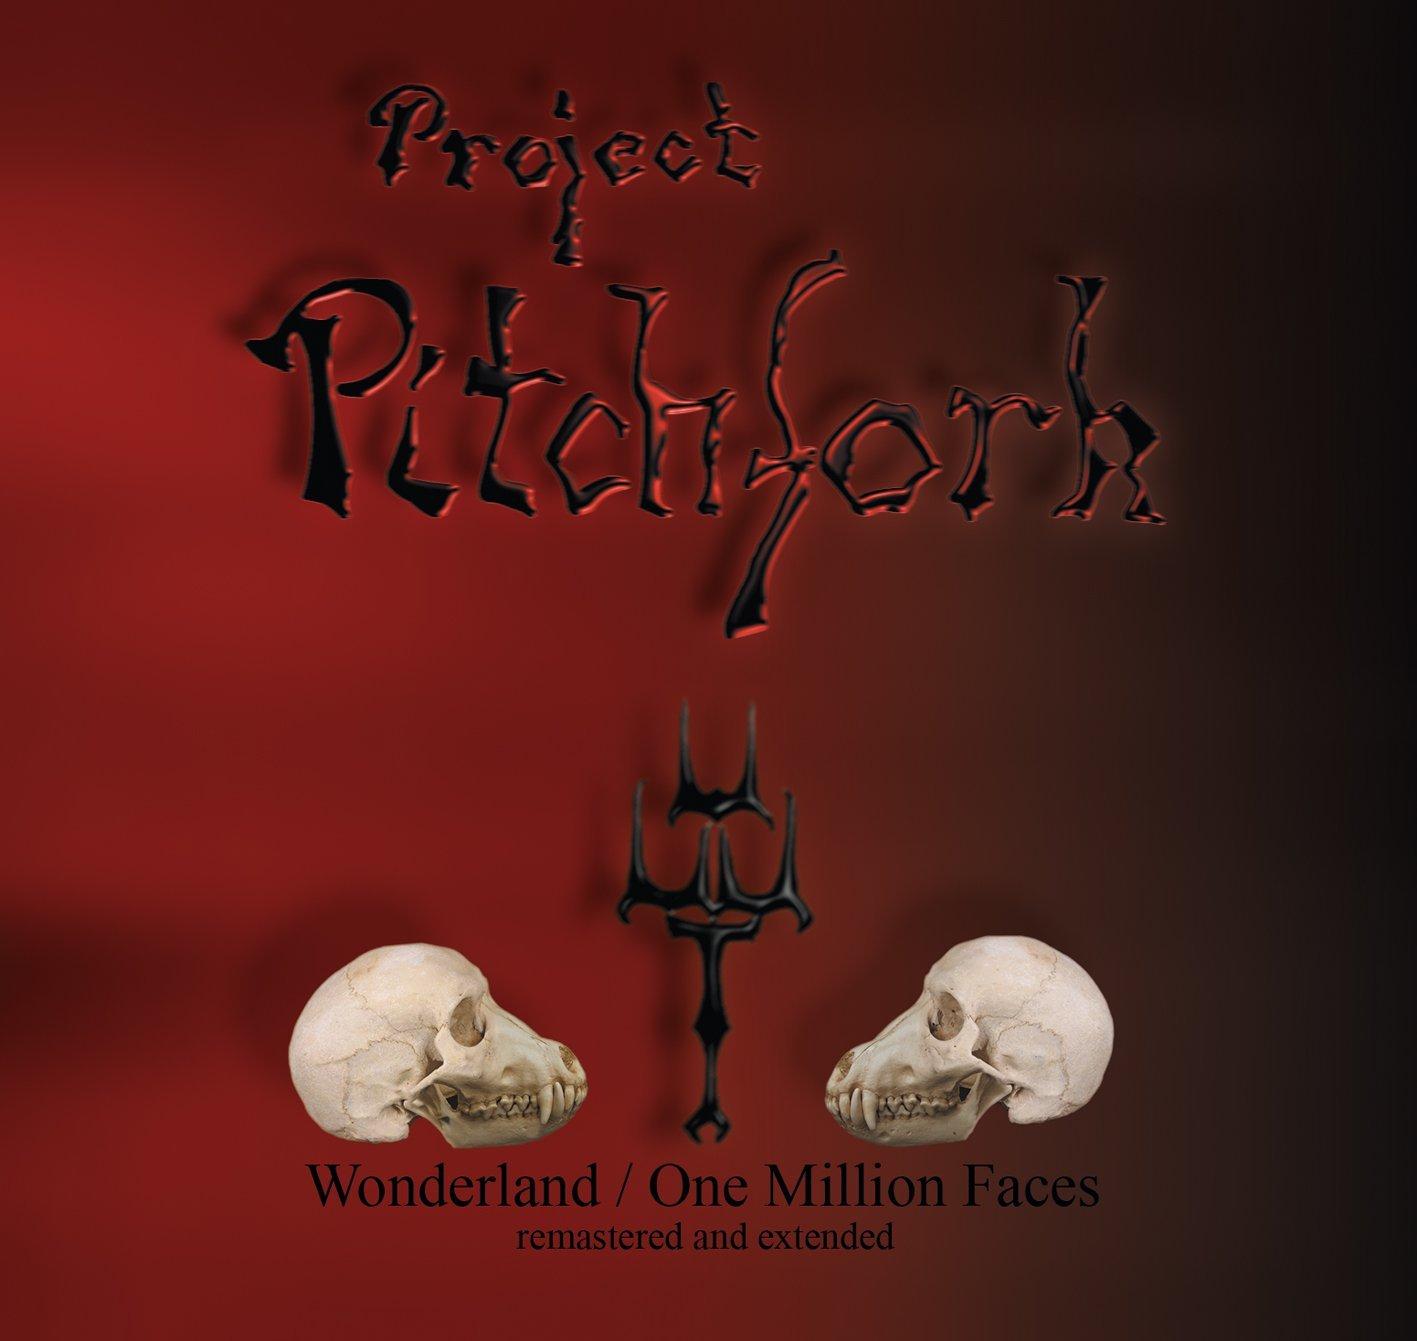 PROJECT PITCHFORK Wonderland/One Million Faces (Remastered & Extended) CD (VÖ 24.06)